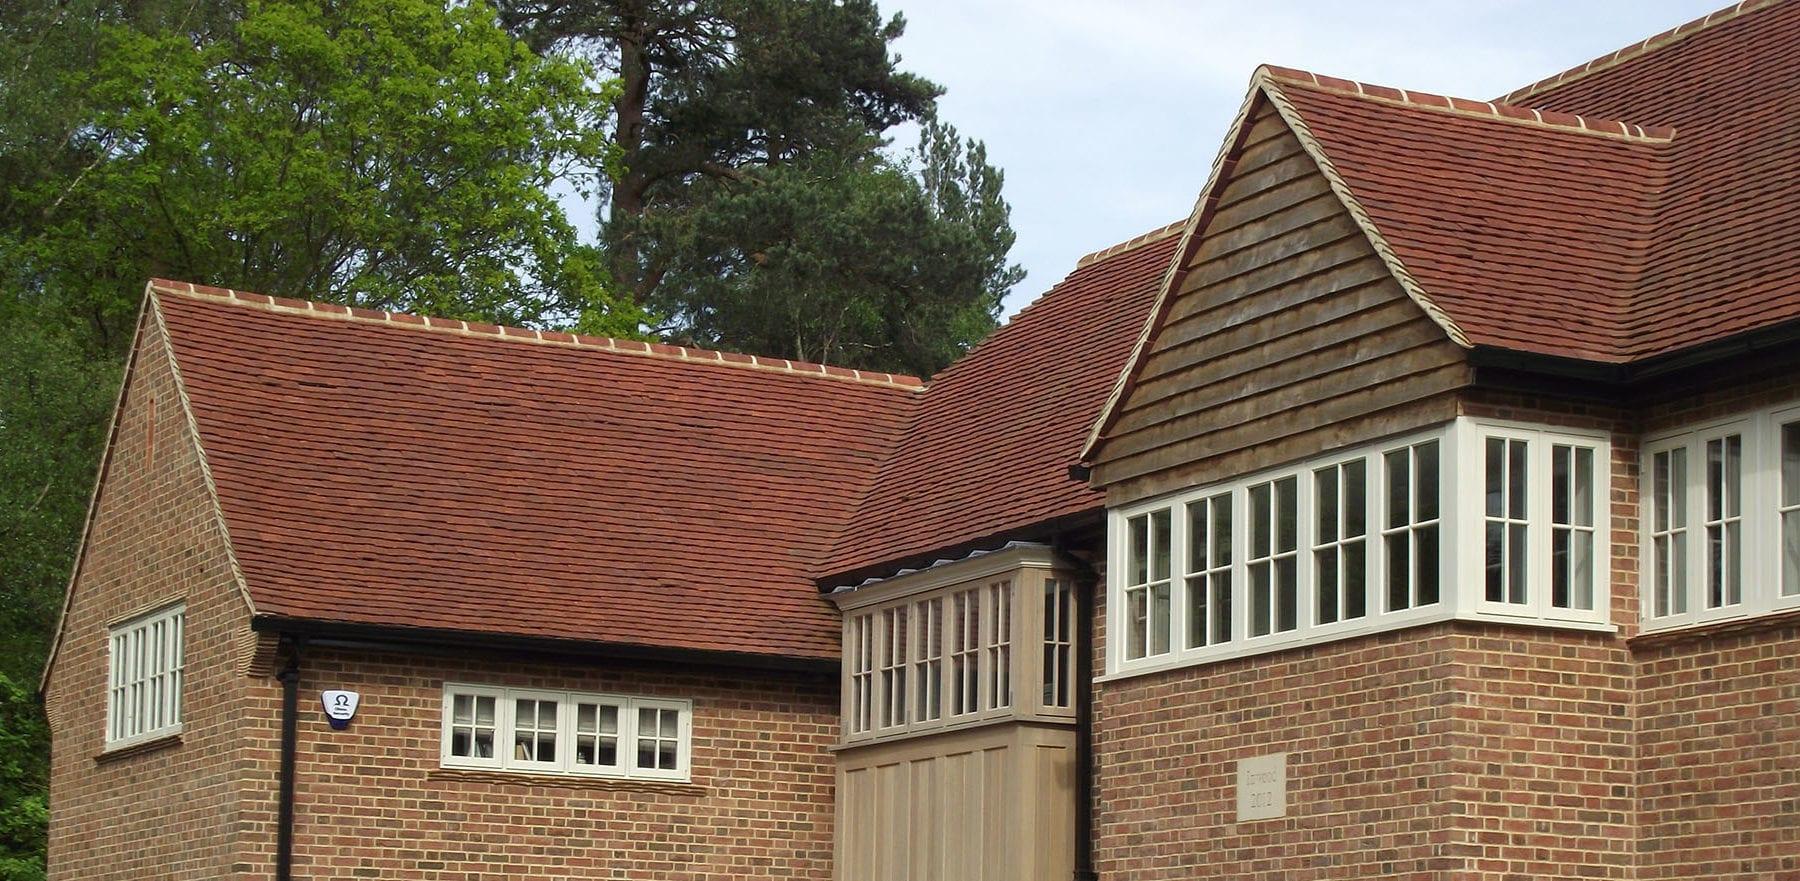 Lifestiles - Handmade Heather Clay Roof Tiles - Godalming, England 2